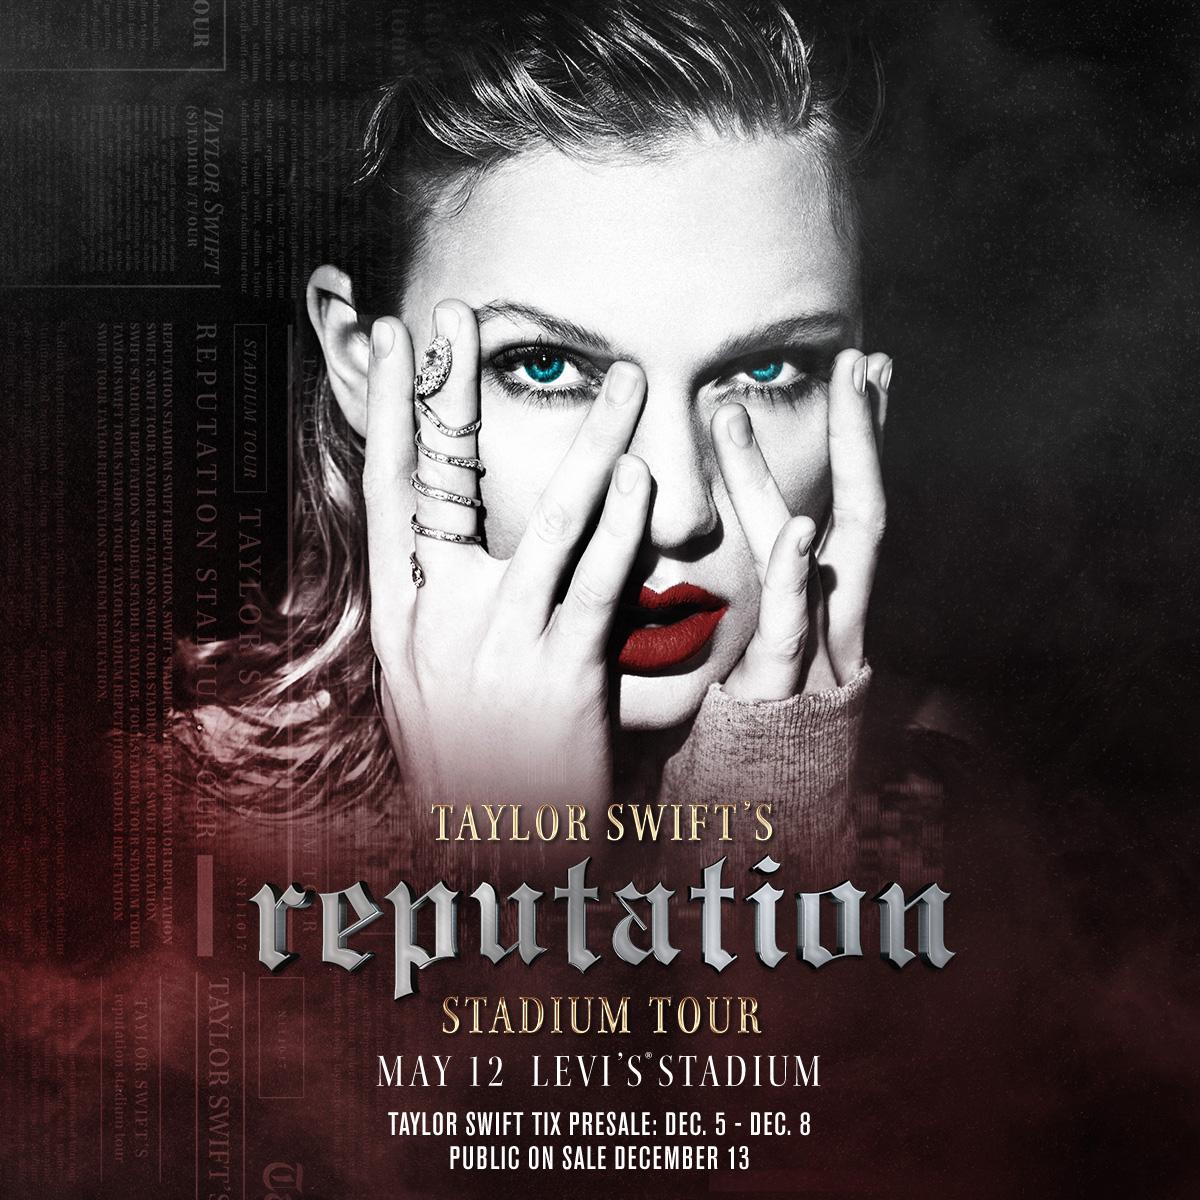 Taylor Swift Returns To Levis Stadium With Reputation Stadium Tour